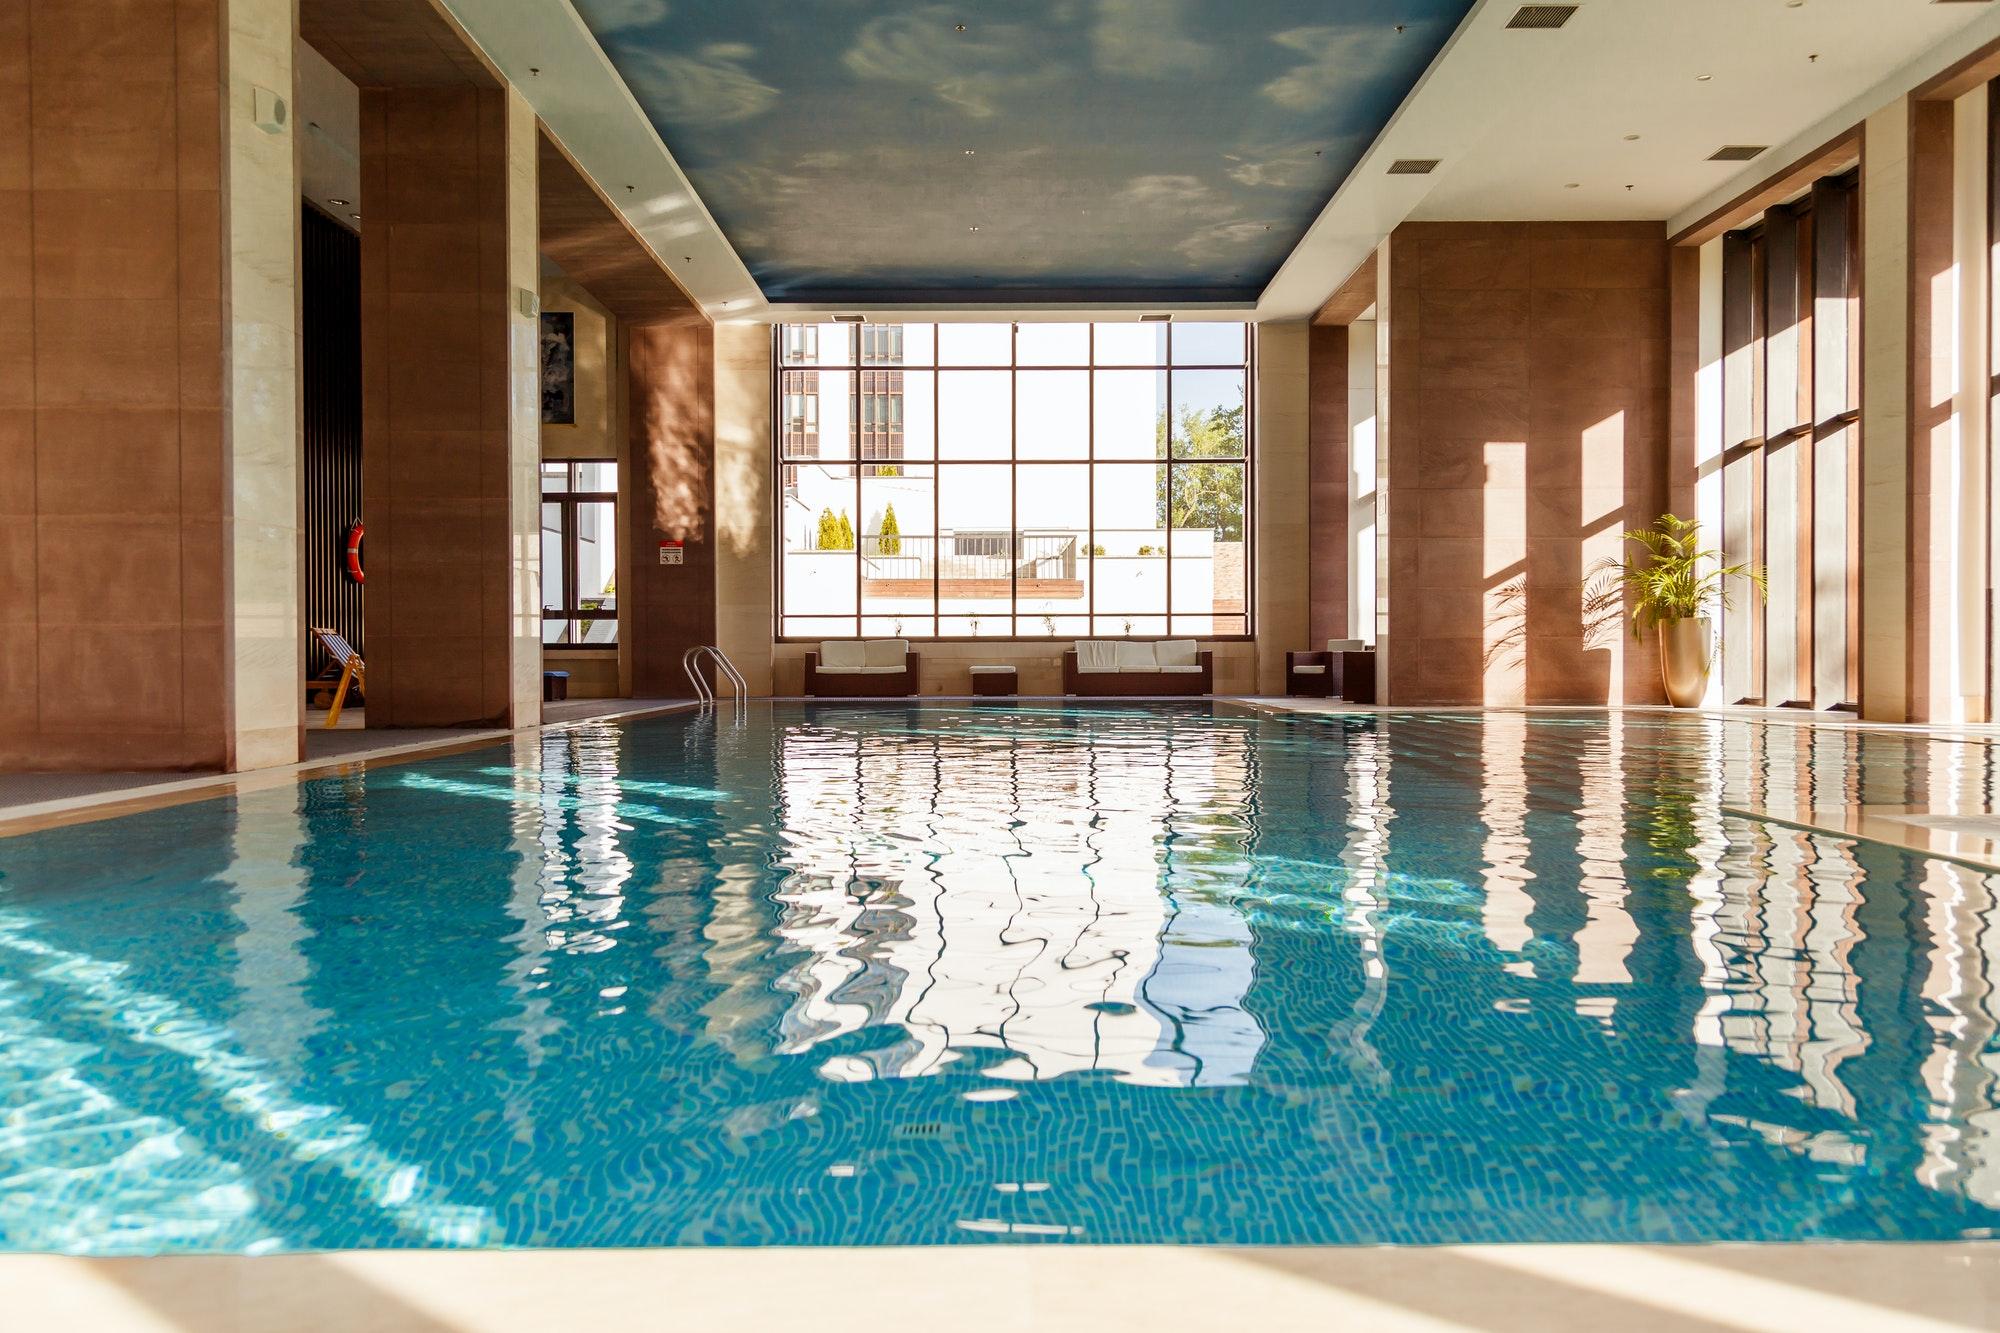 luxury wellness retreat - Indoor swimming pool interior